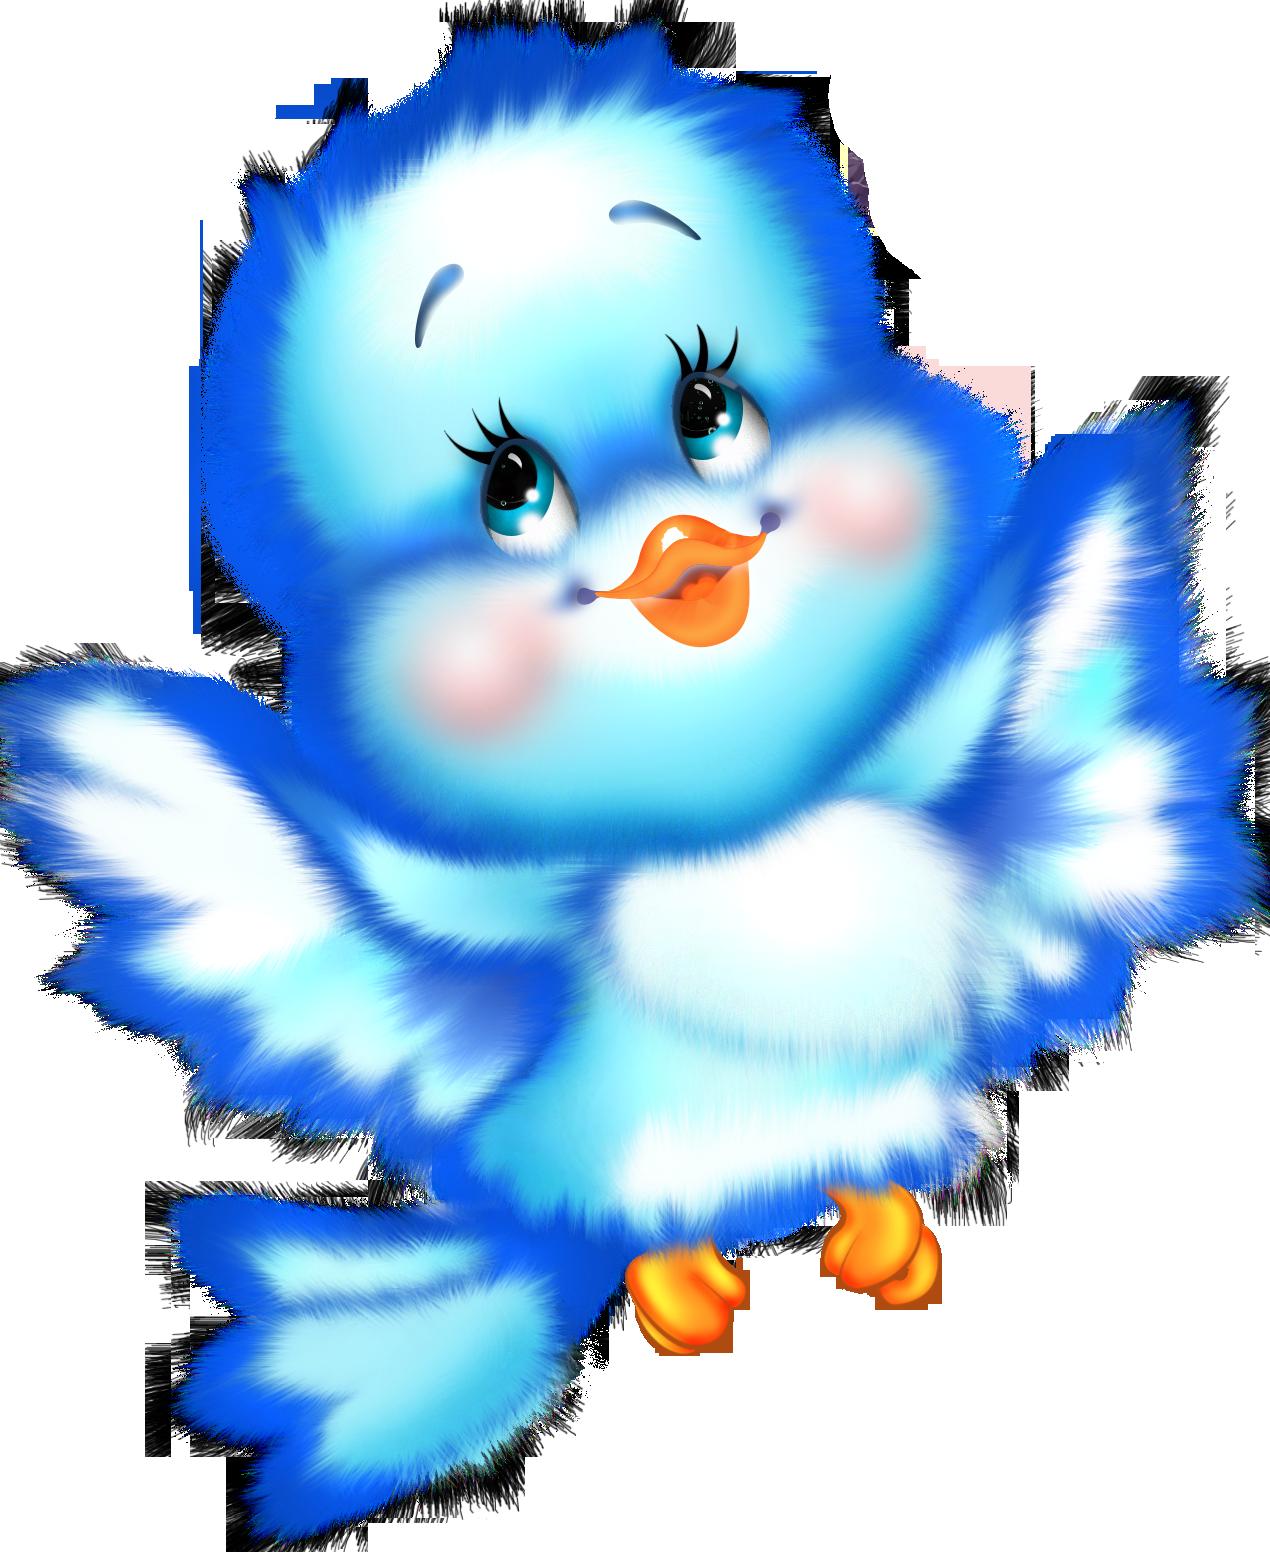 Cute turkey and animal friends clipart clipart free library Cute Blue Bird Cartoon Free Clipart | ღ❣Kid's~Stuff❣ღ ... clipart free library